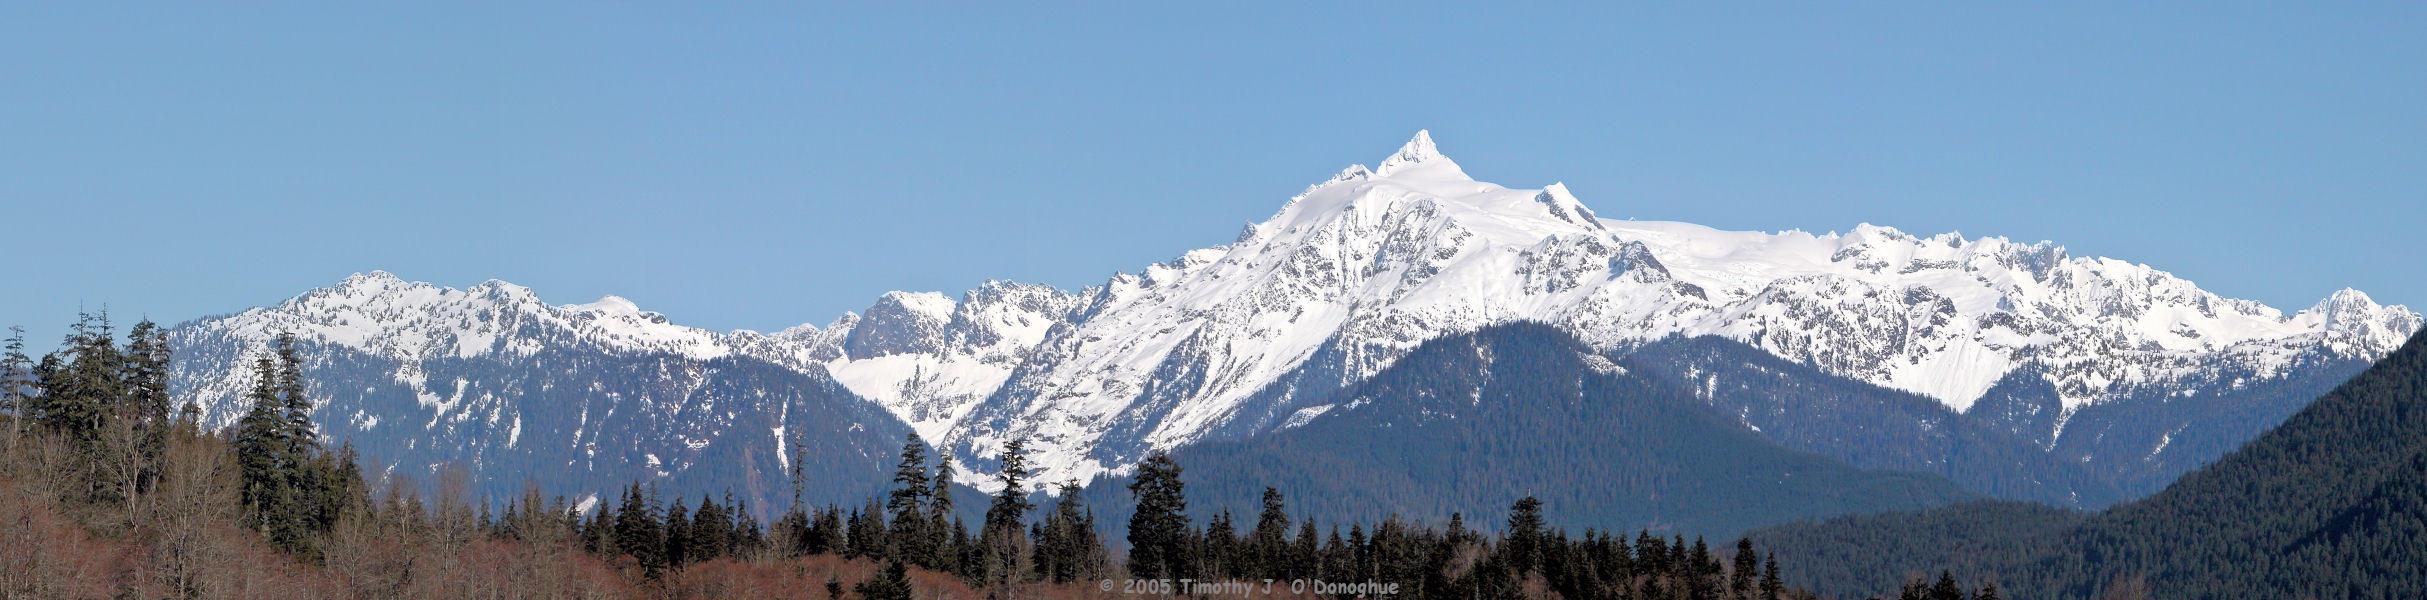 South Face of Mount Shuksan, WA